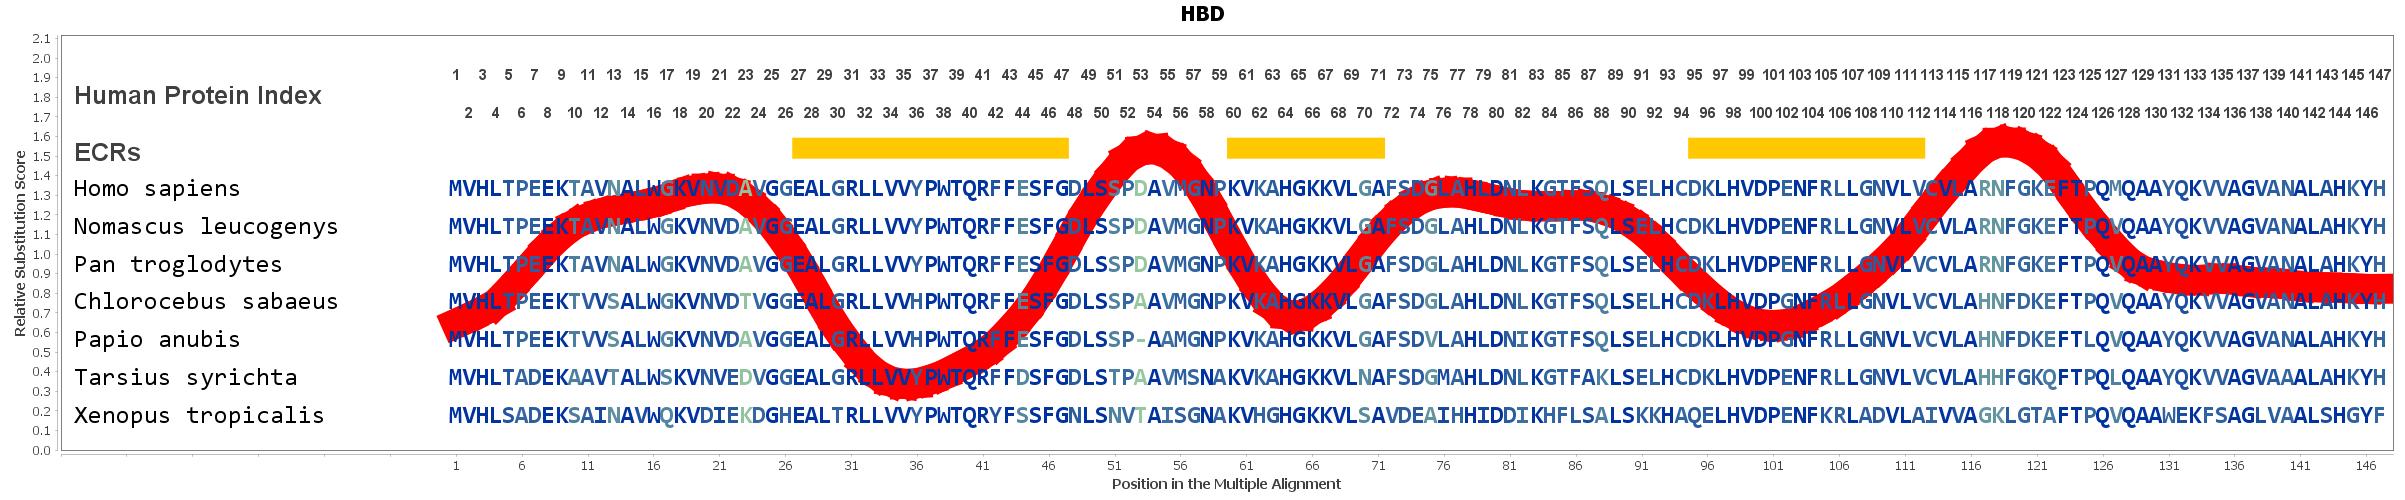 HBD Gene - GeneCards | HBD Protein | HBD Antibody